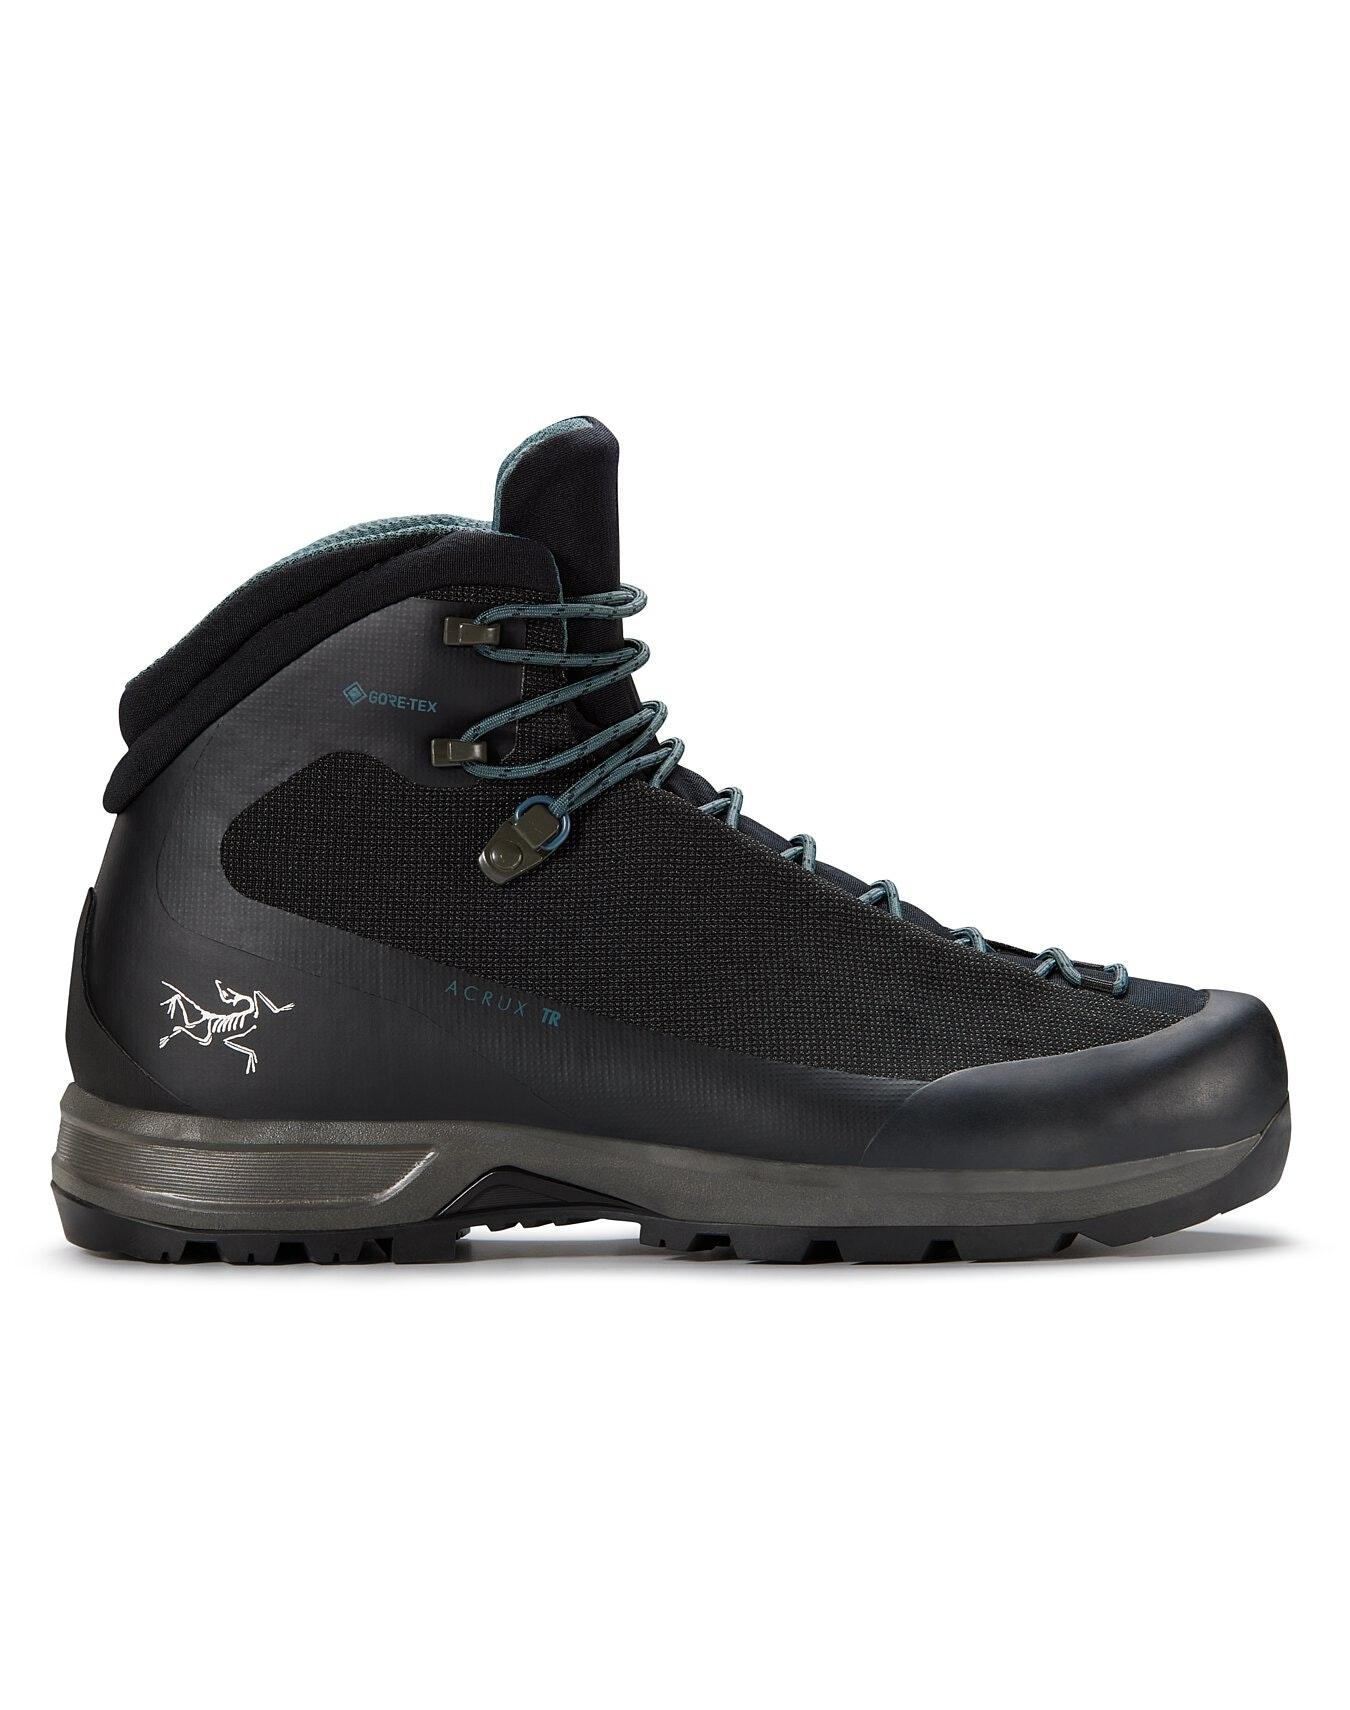 Acrux TR GTX Boot Black/Neptune